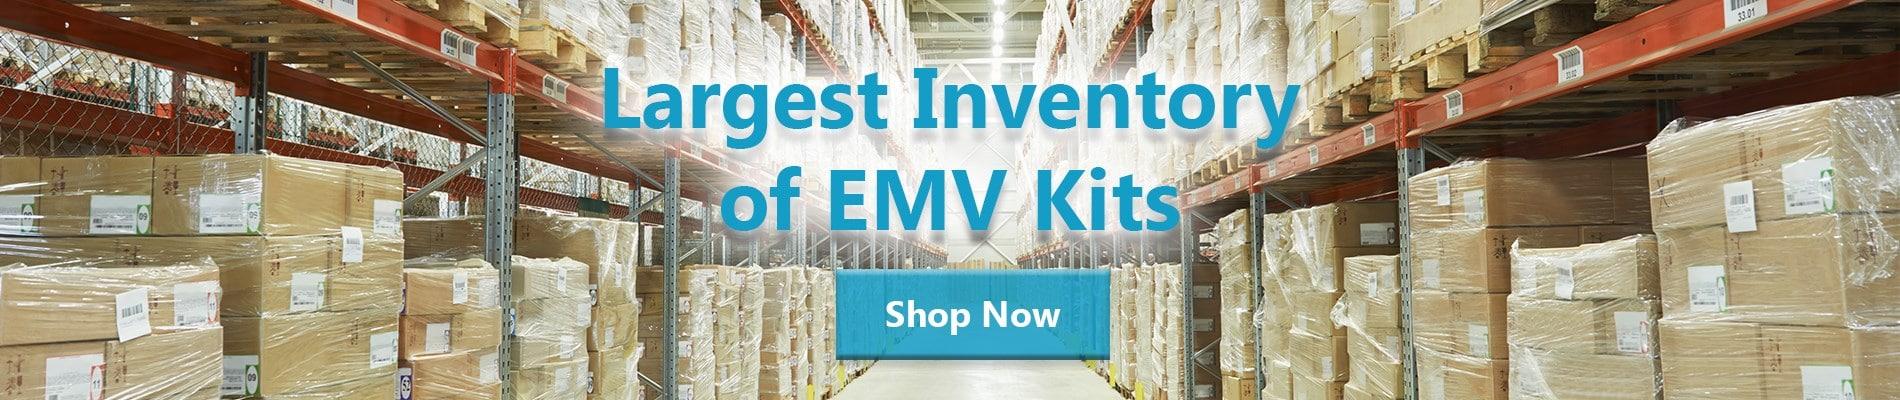 EMV-banner-_web